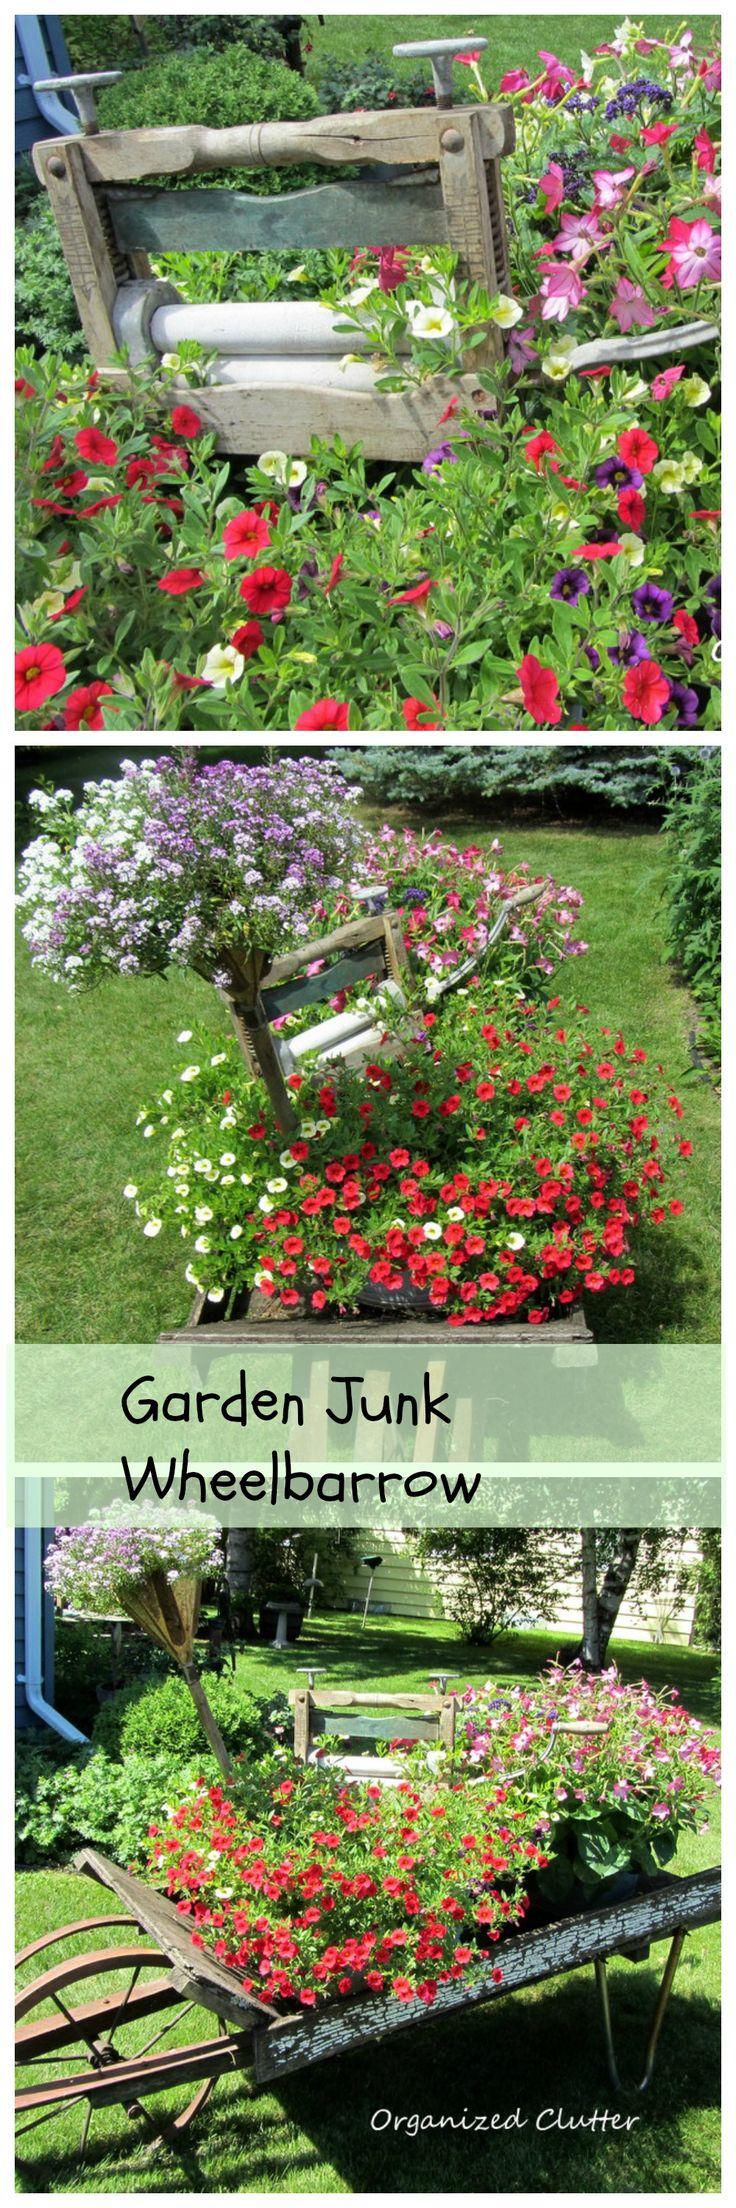 262 best rustic garden decor images on pinterest gardening garden ideas and outdoor gardens